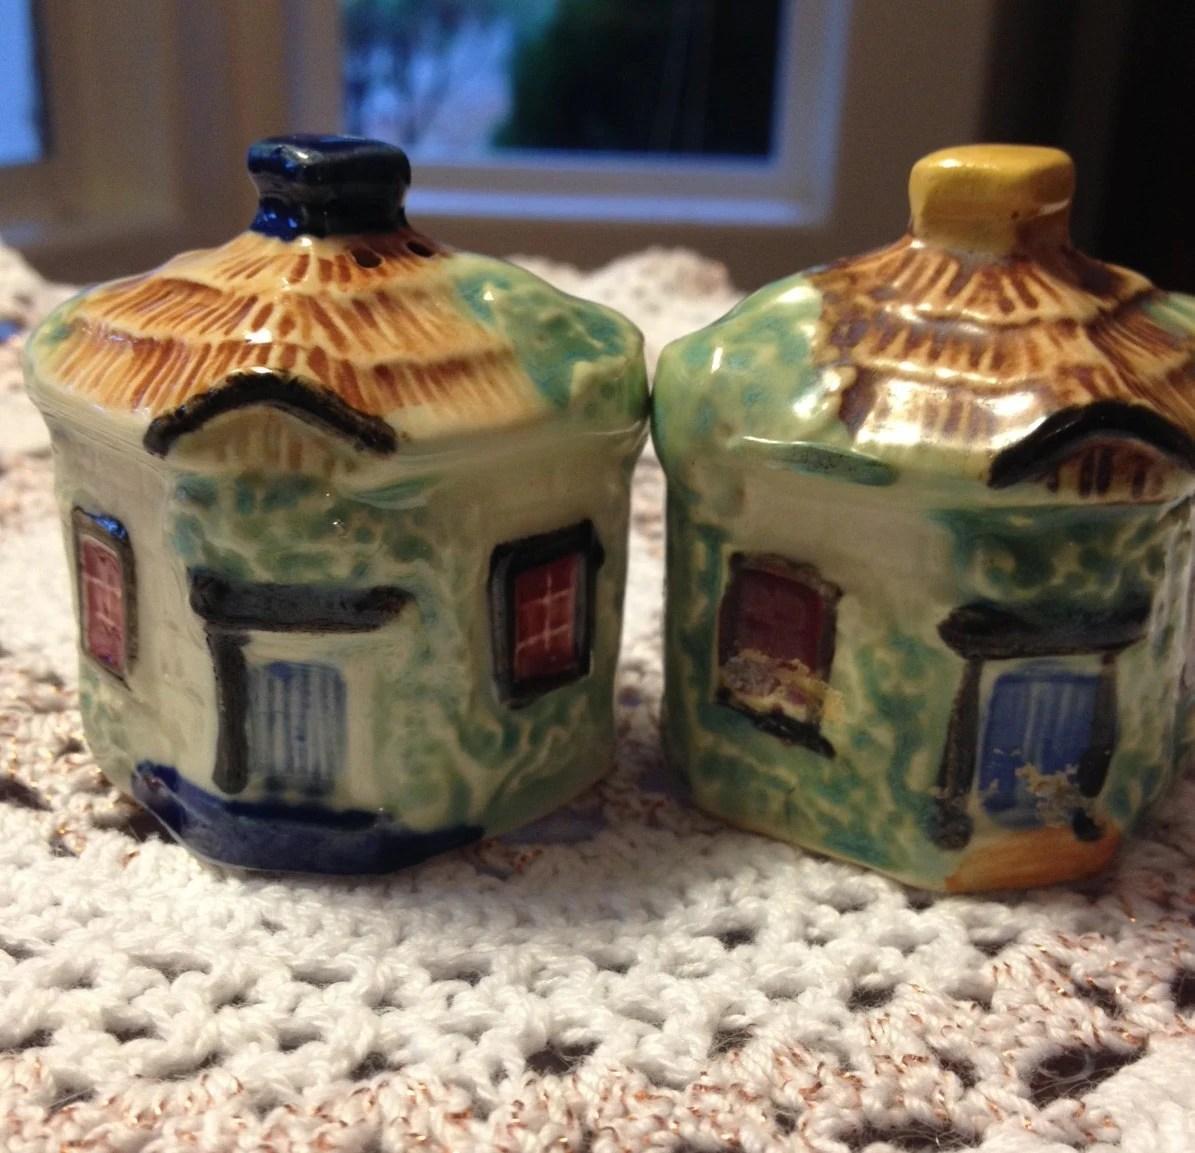 Little Cottage Salt And Pepper Shakers 1960s Haute Juice